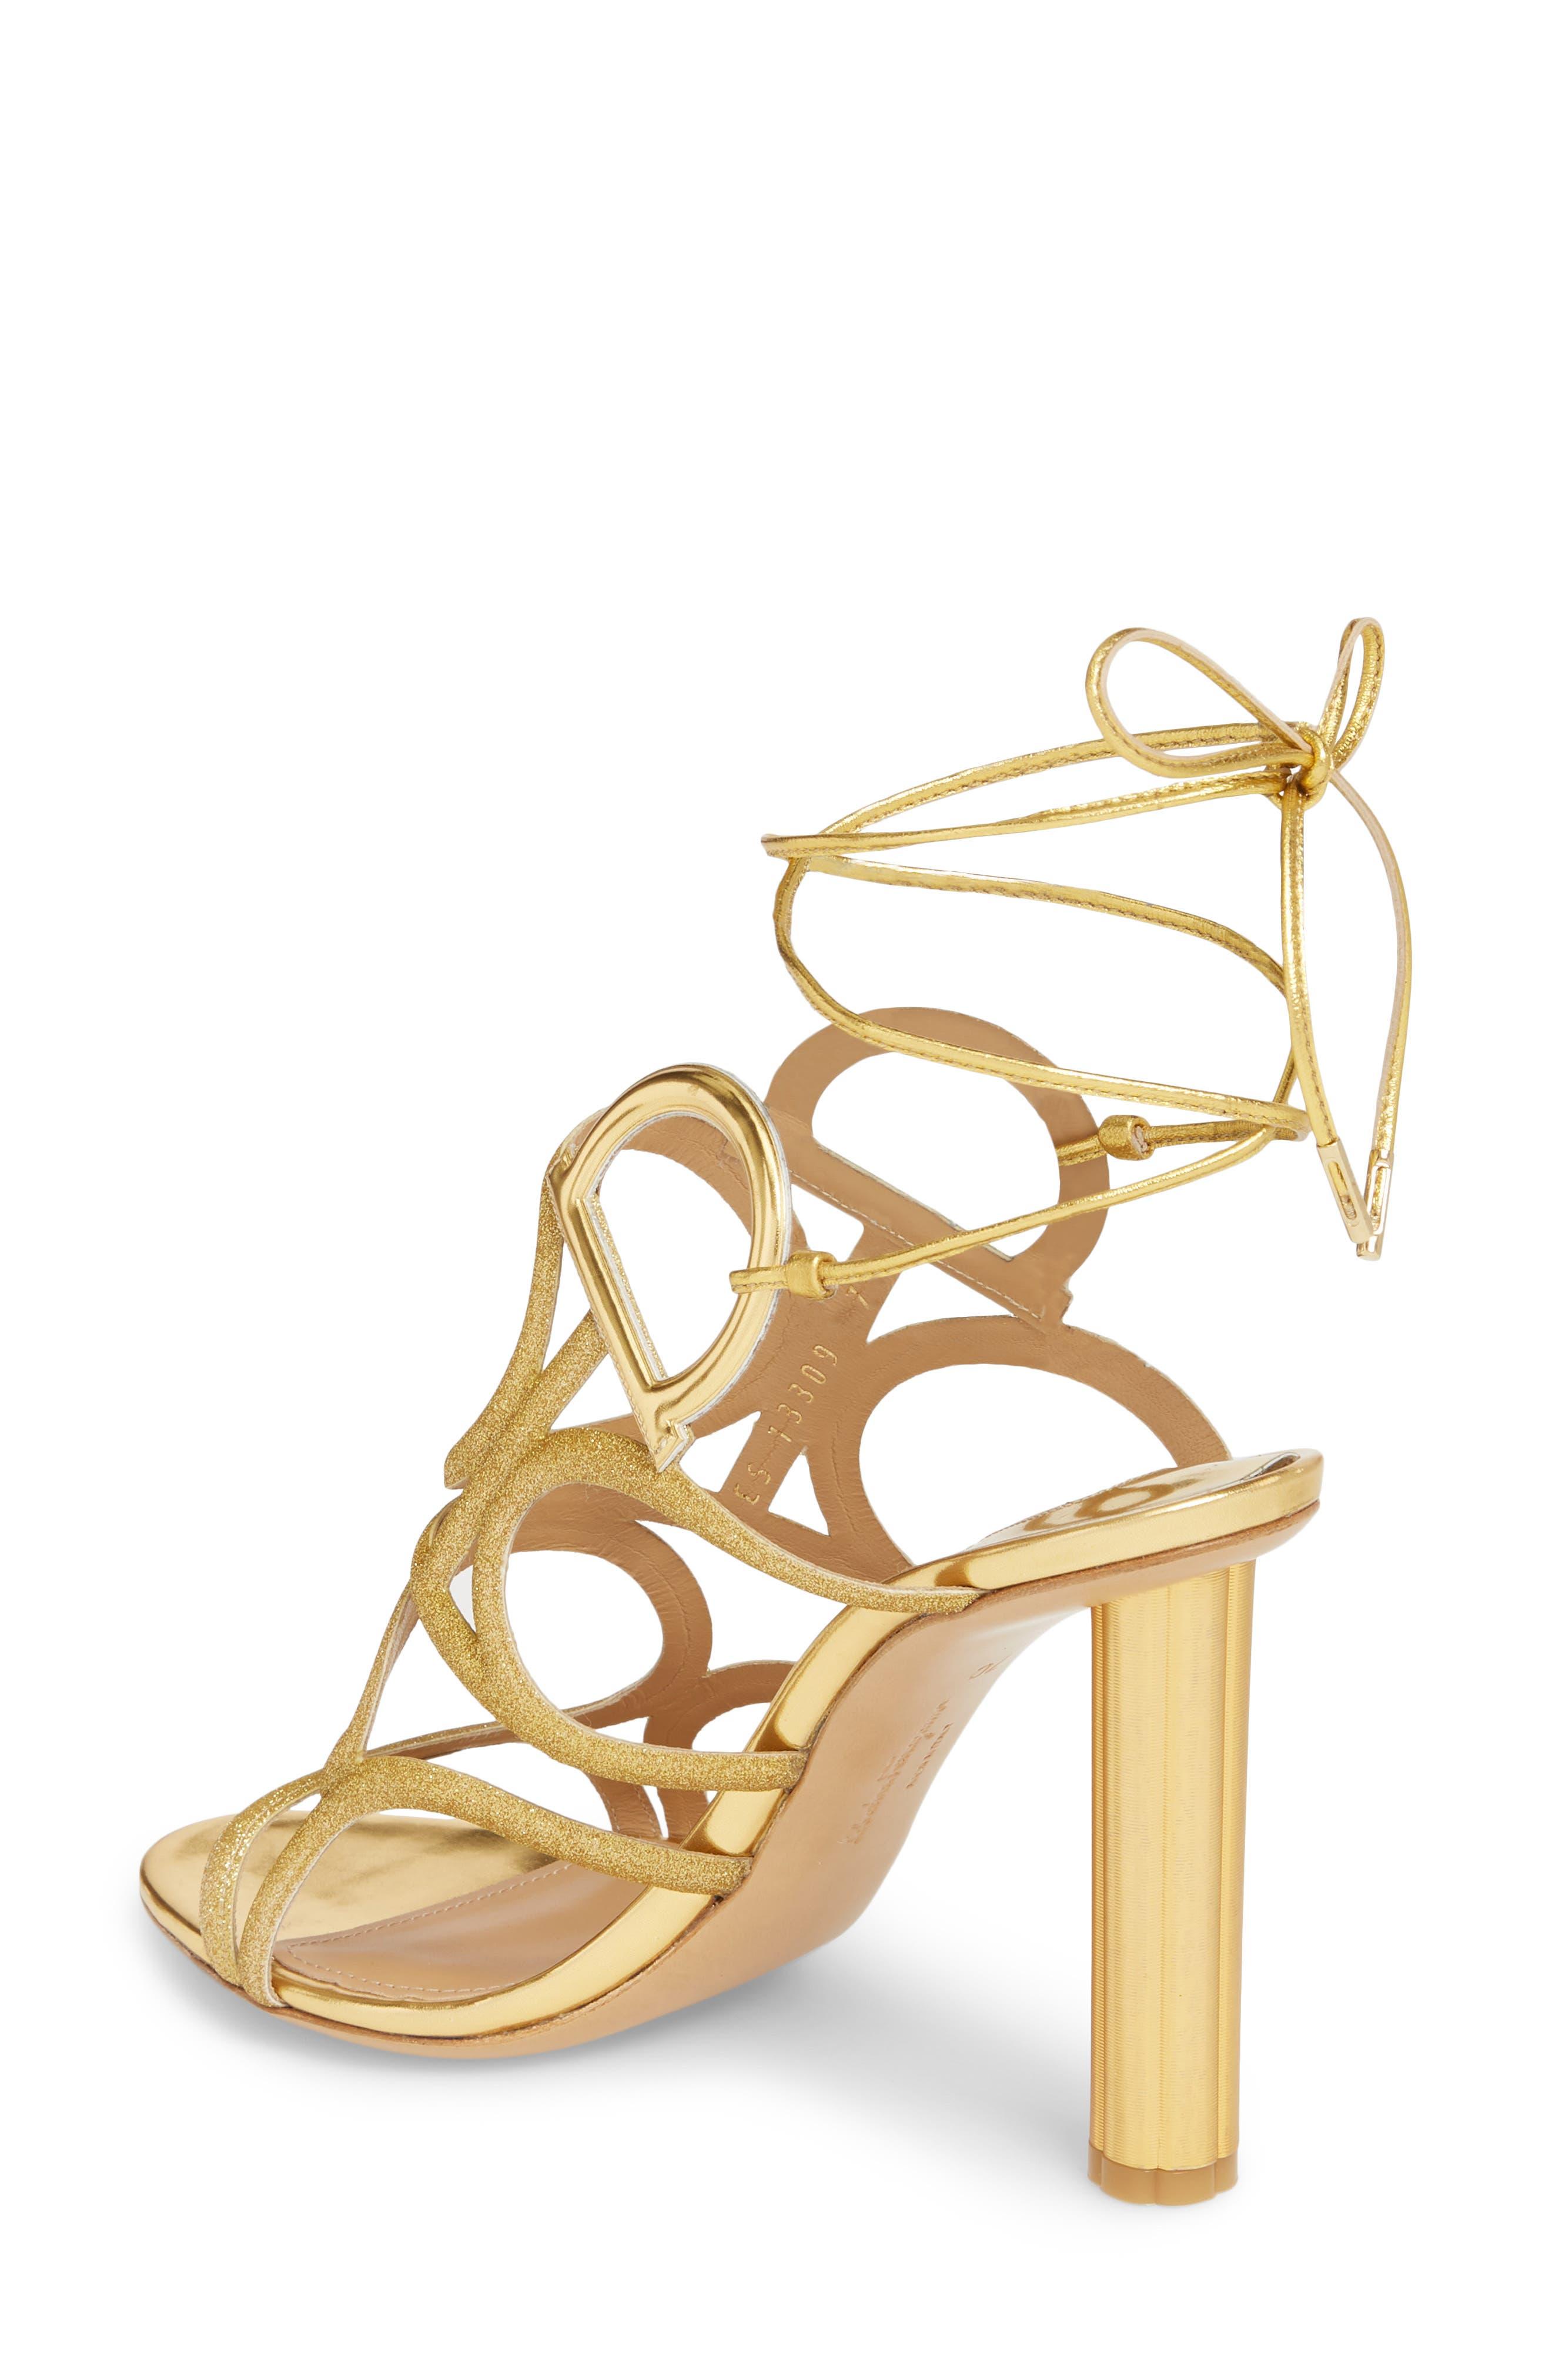 Vinci Lace-Up Heeled Sandal,                             Alternate thumbnail 2, color,                             710